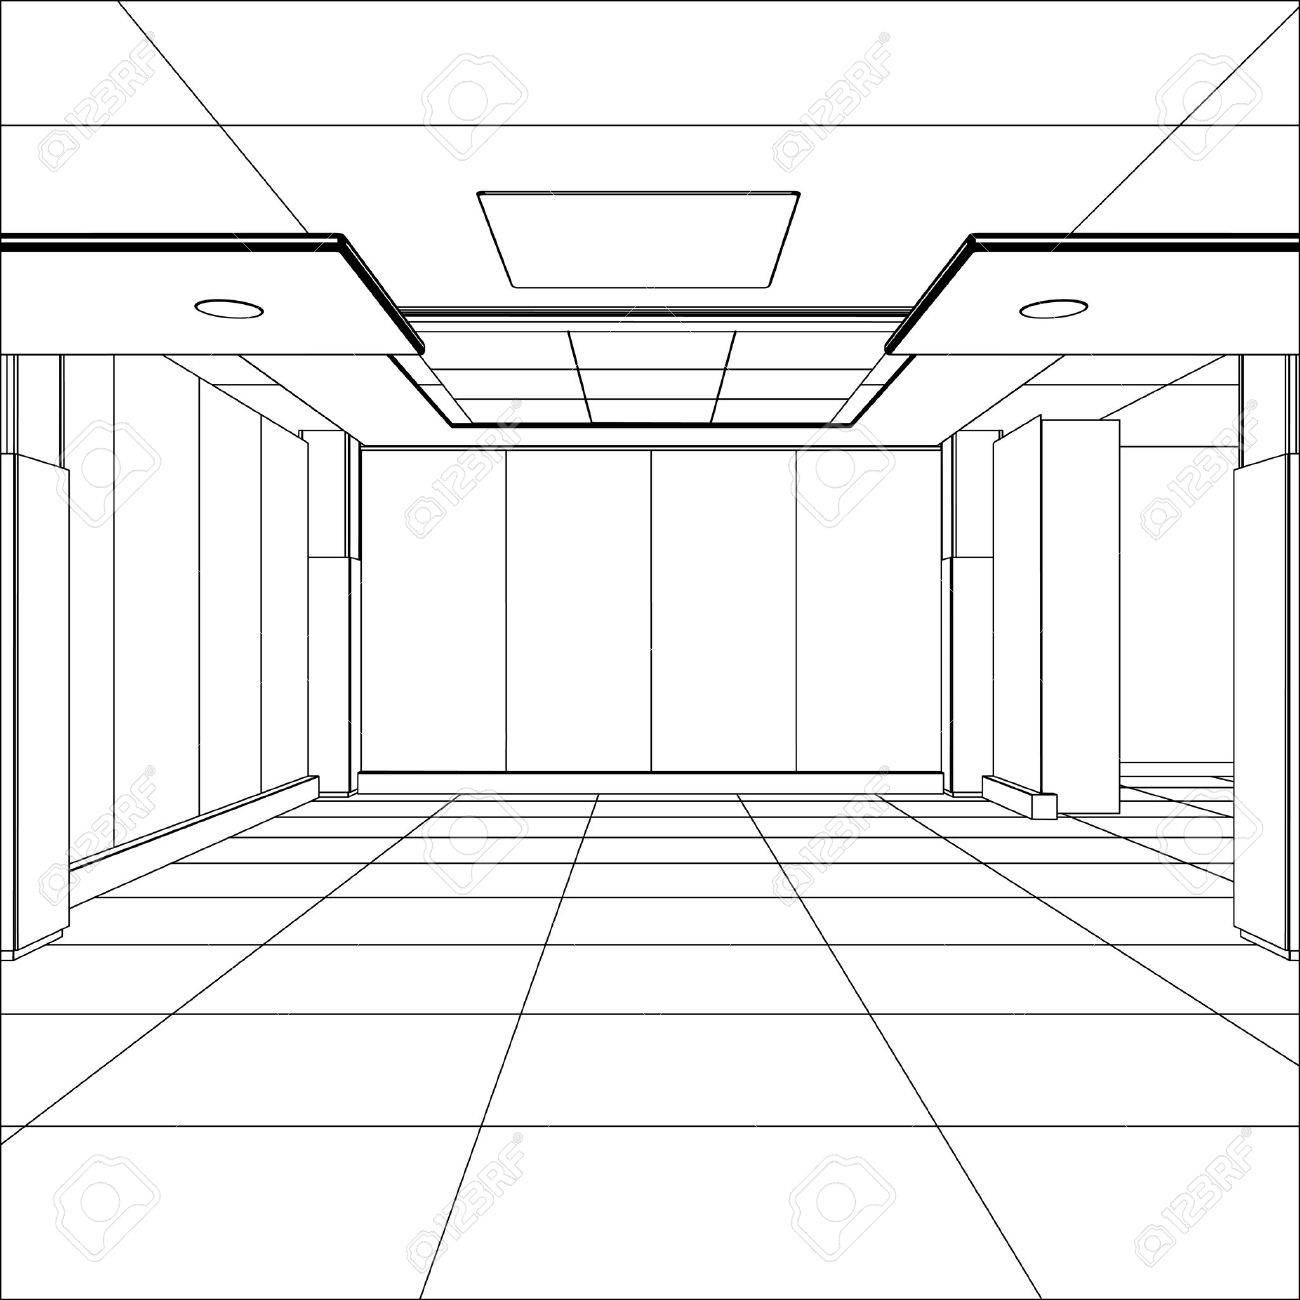 Outline office room. EPS 10 vector format. - 37737063